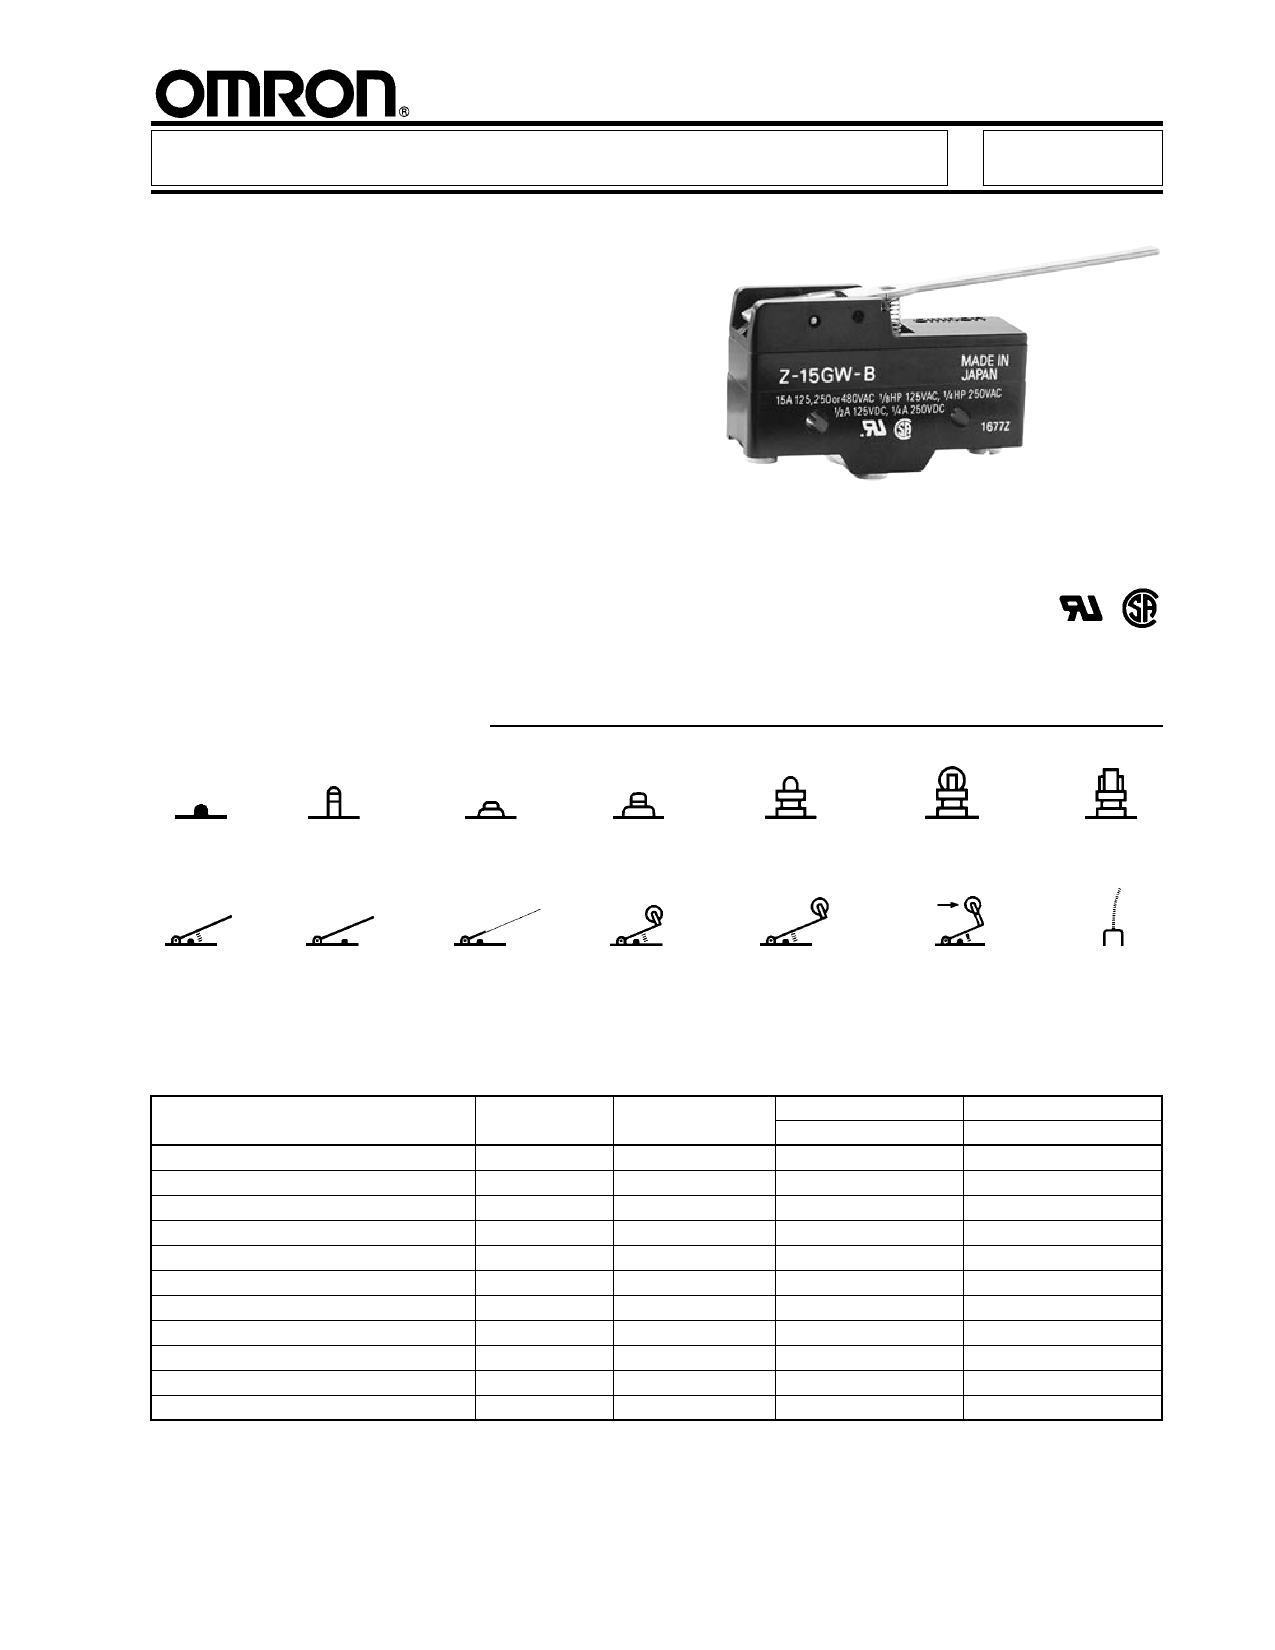 Z-15GD Hoja de datos, Descripción, Manual